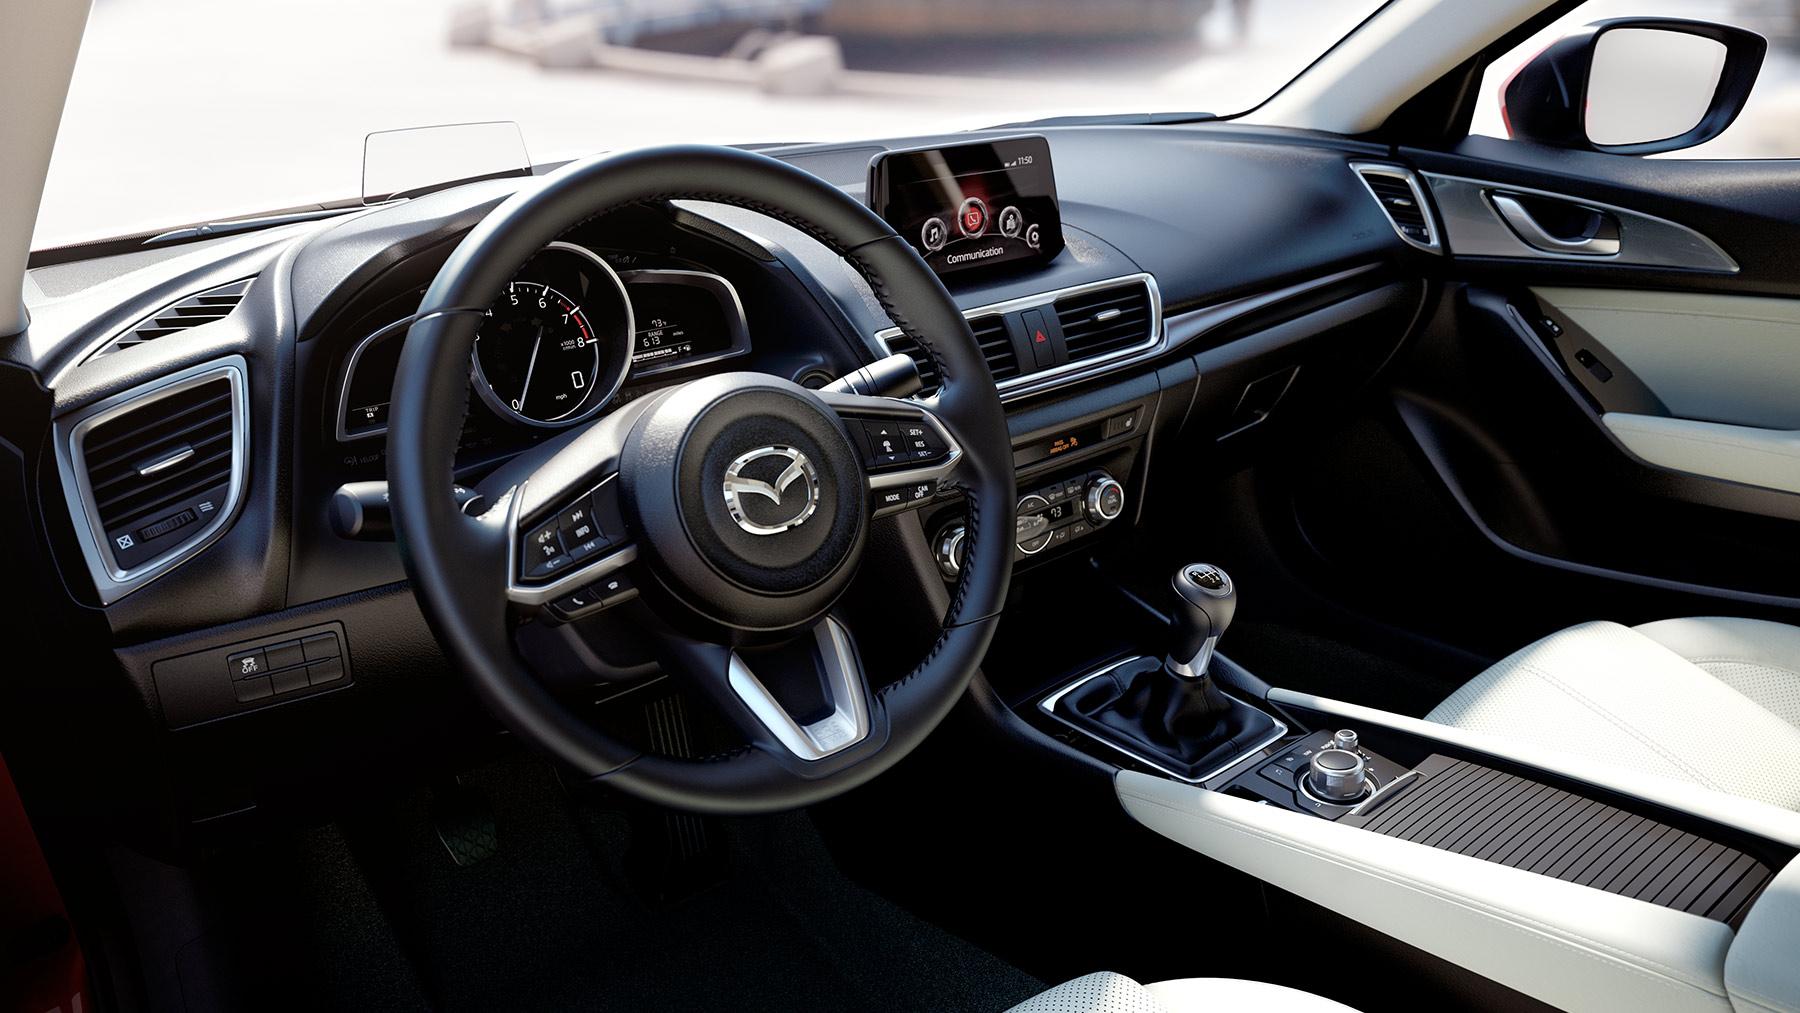 2018 Mazda3 4-door Dashboard Interior